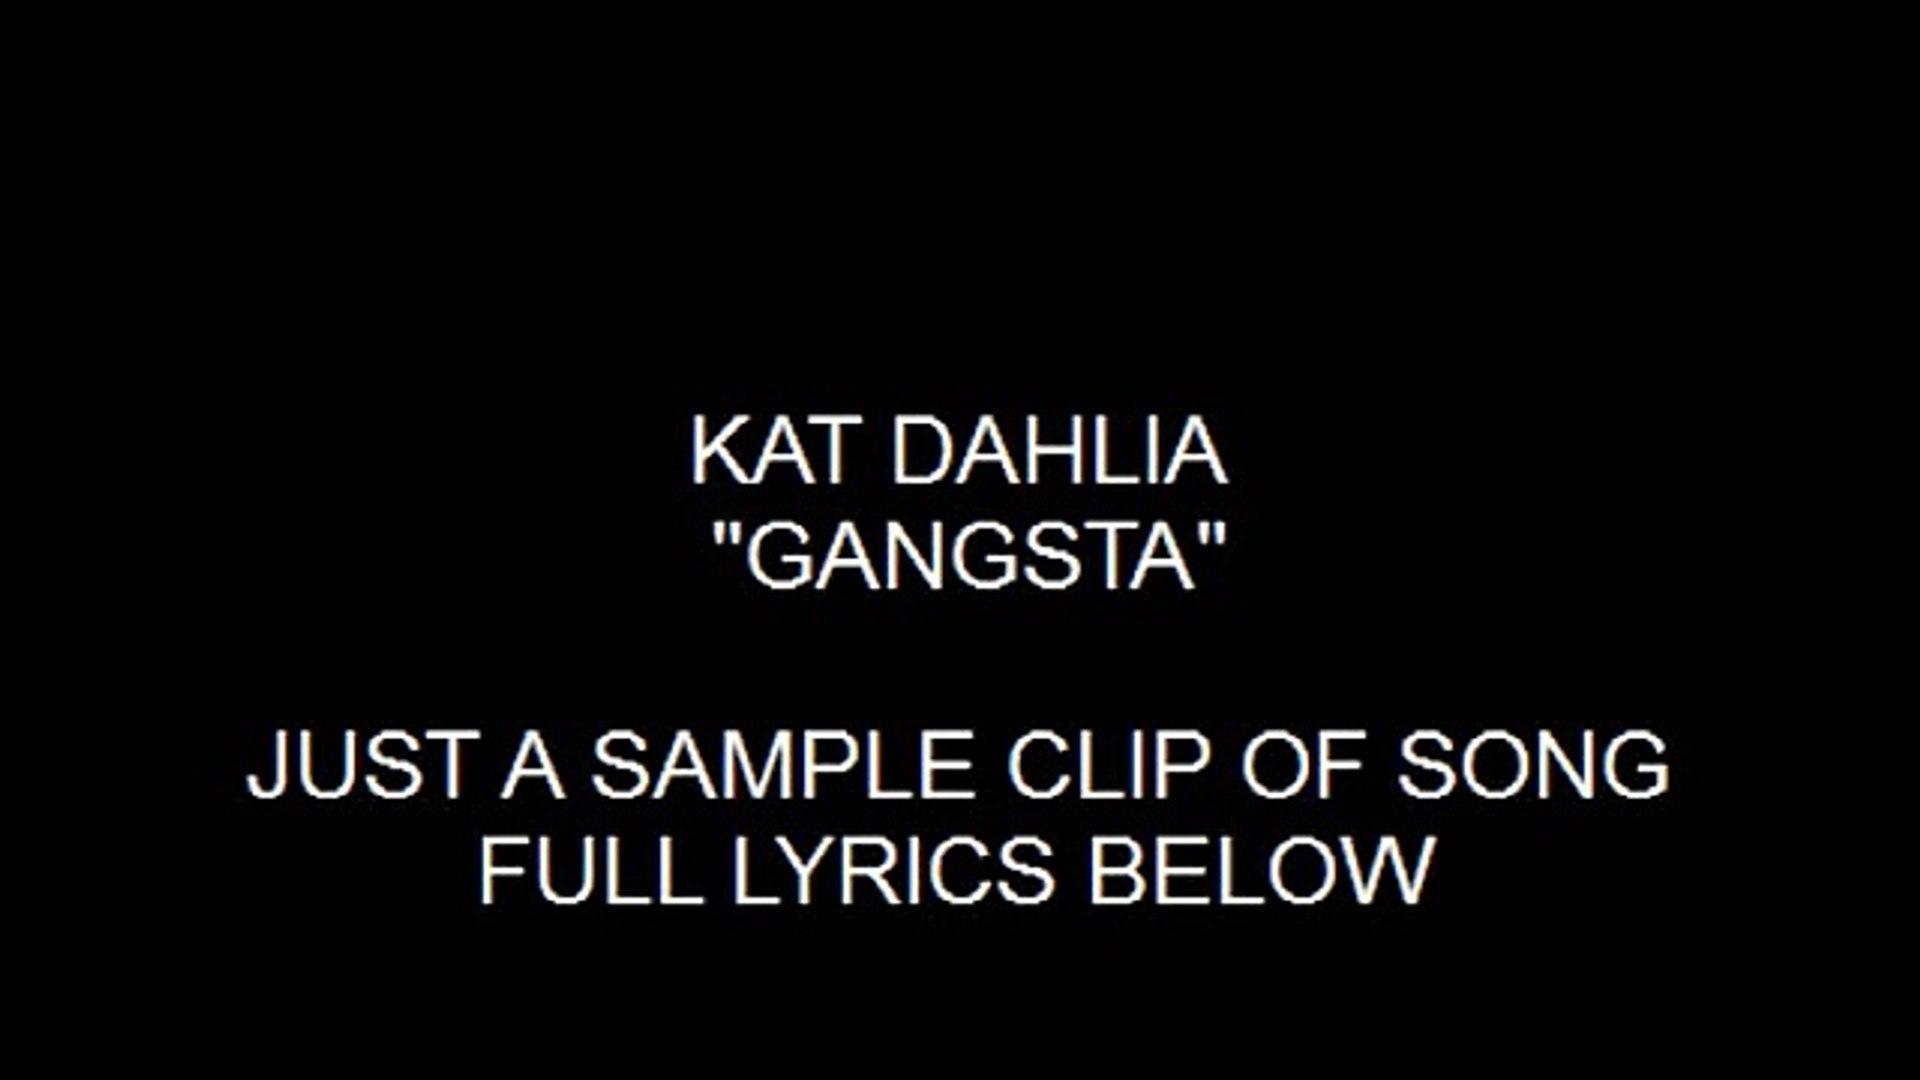 Kat Dahlia - Gangsta with Full Lyrics